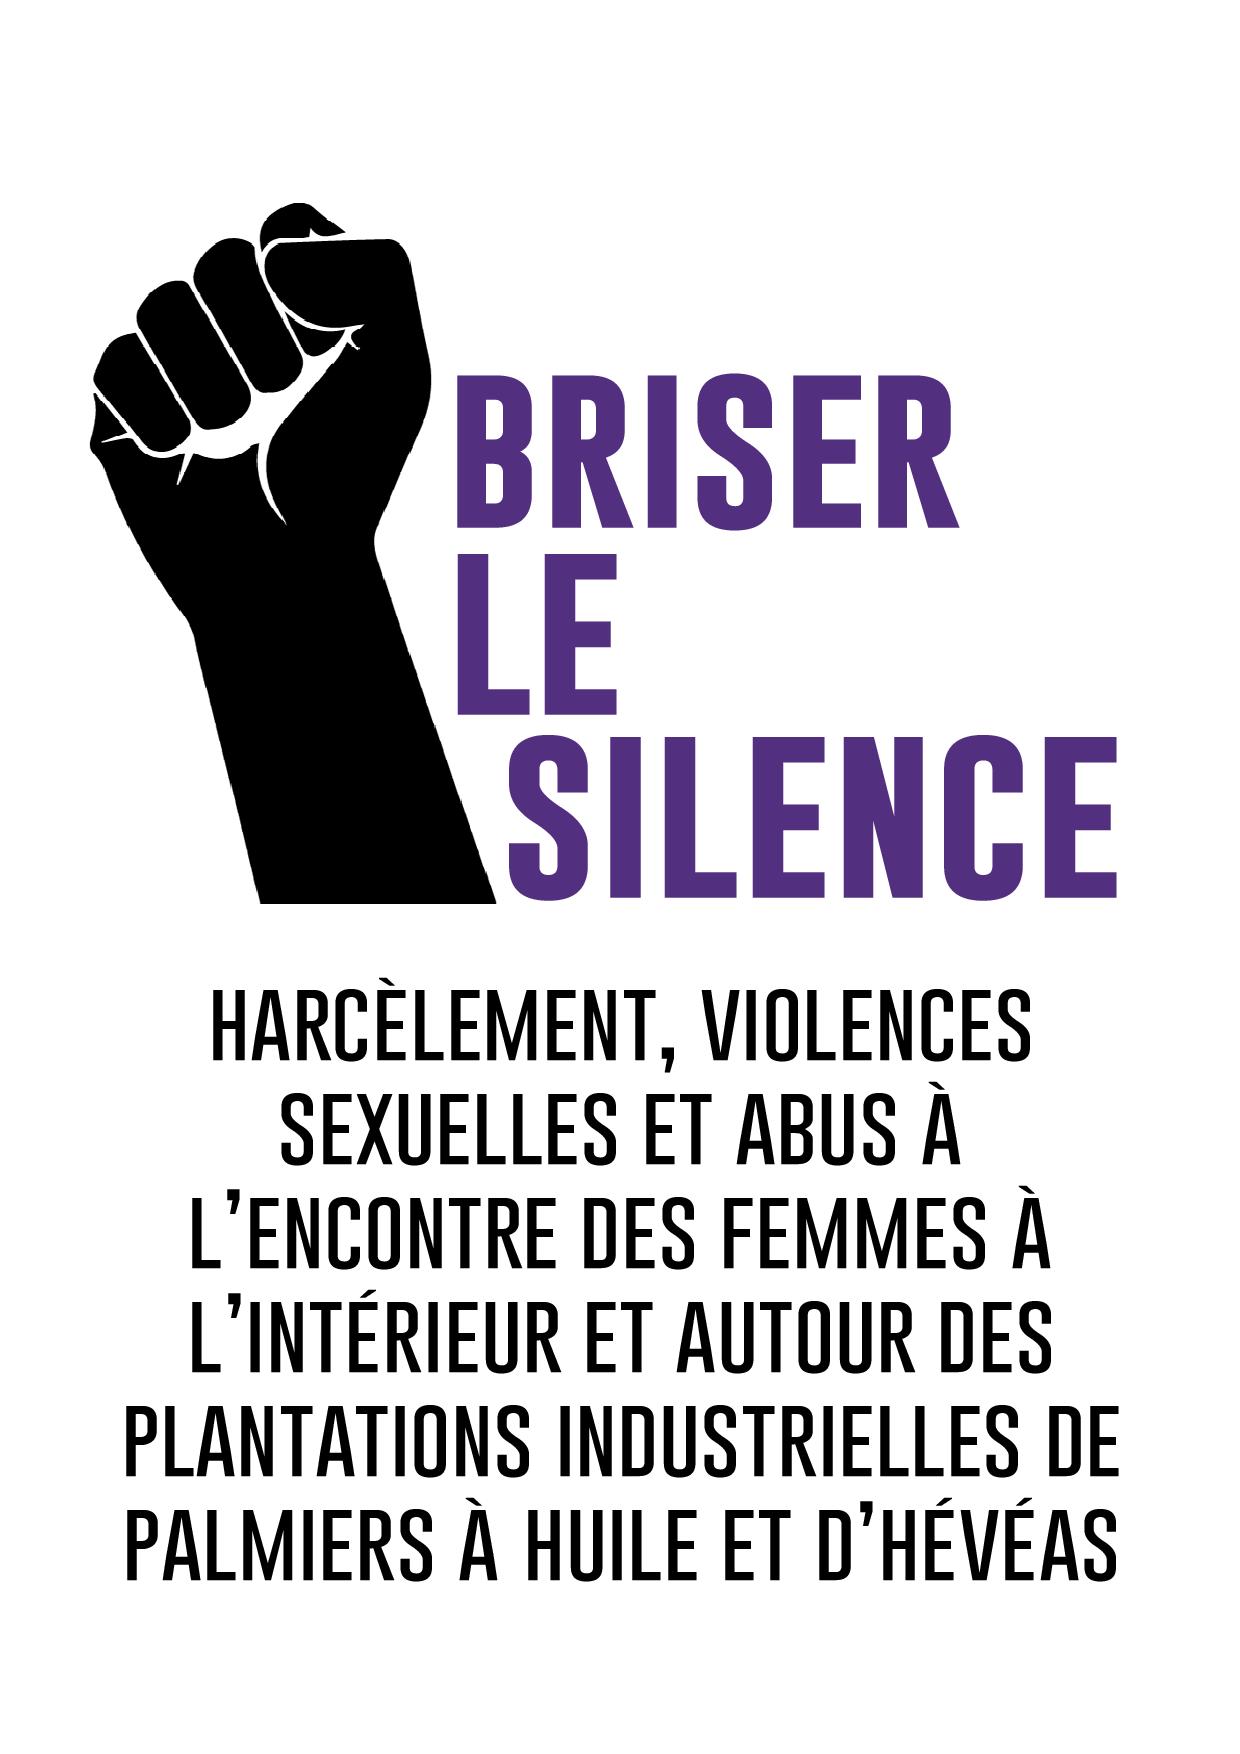 Briser le silence_8Mars2019.png